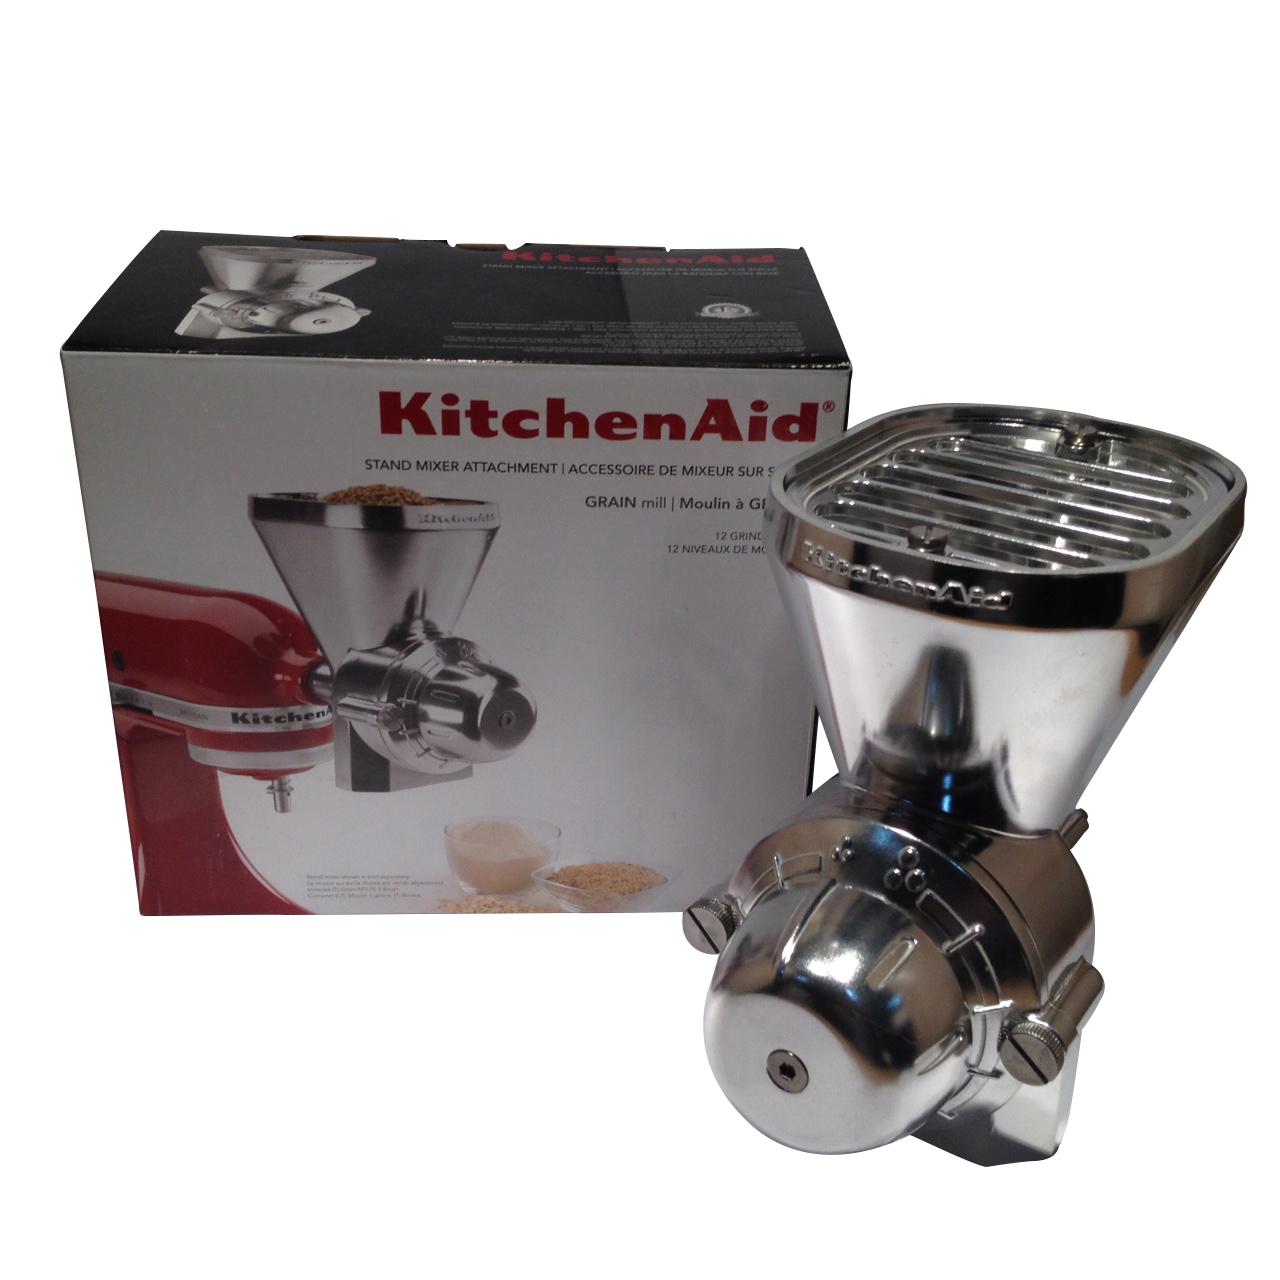 kitchen aid mixer accessories white sinks kitchenaid stand grain mill attachment kgm w10318099 ...